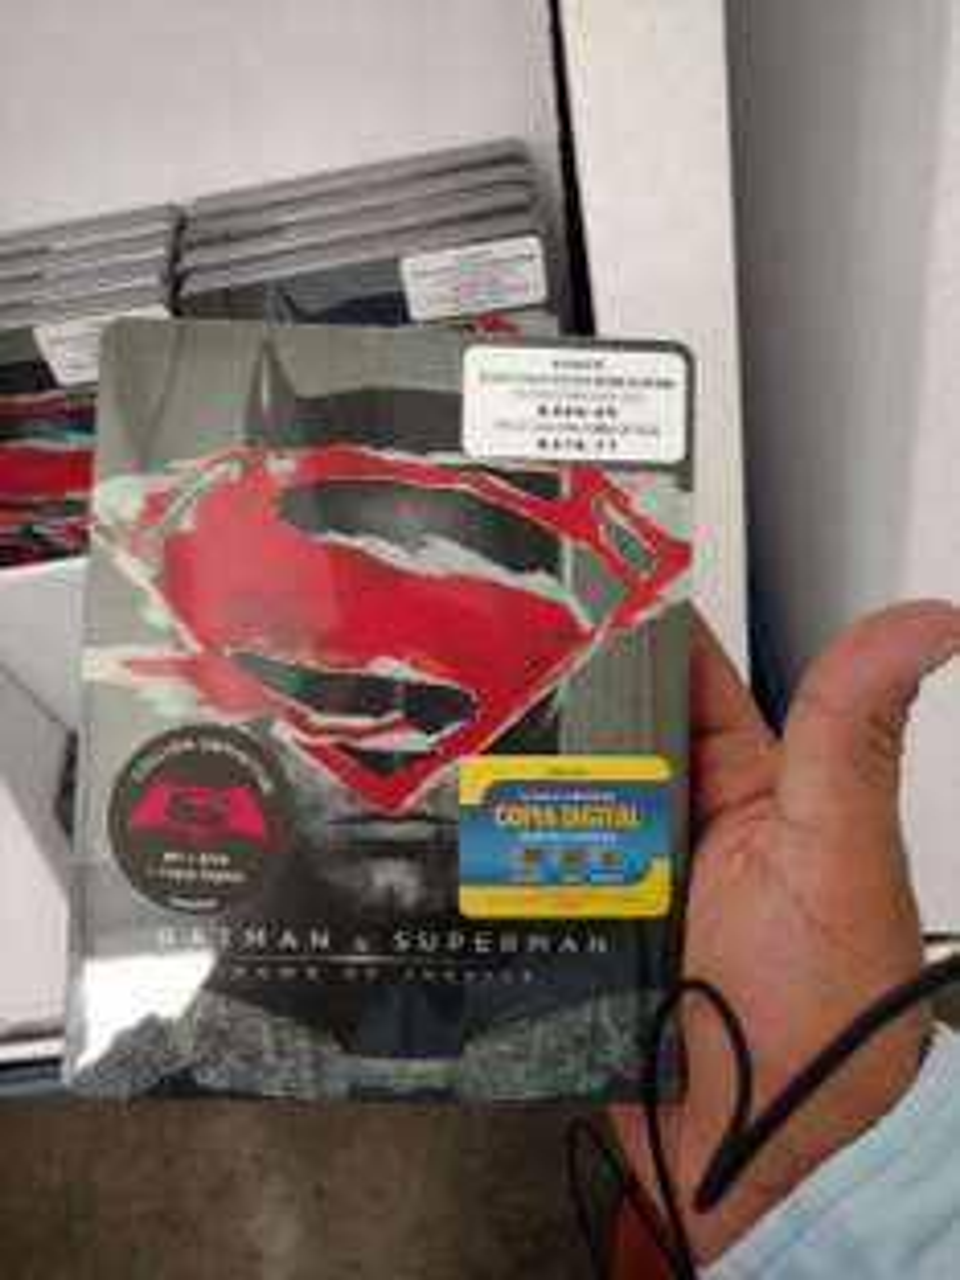 Costco: Batman v Superman ediciones especiales